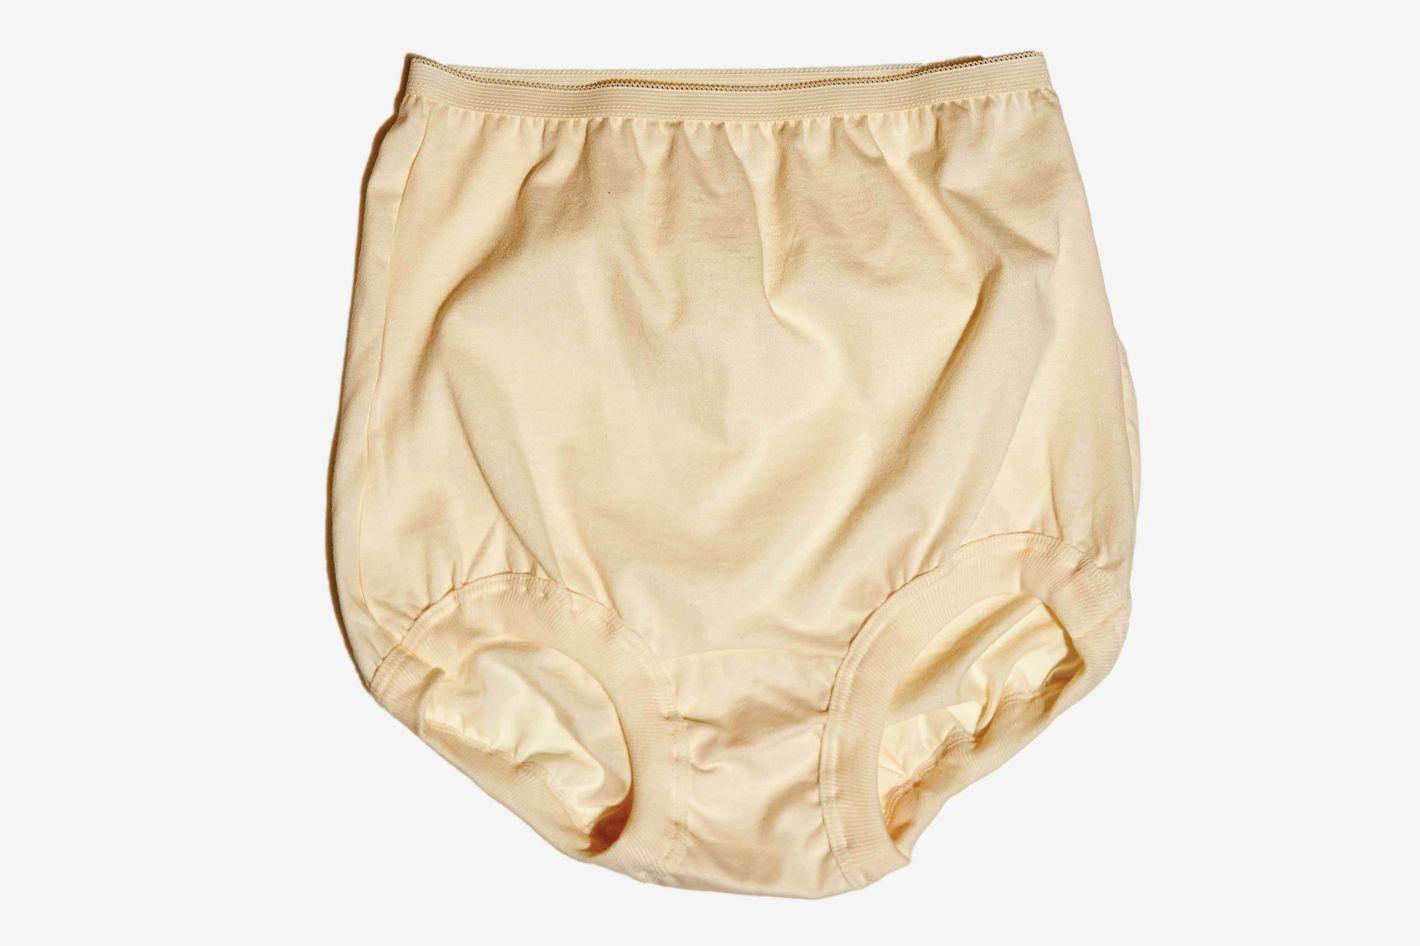 1d2ee2296e4fbc Vanity Fair Women's Lollipop Leg Band Brief Panties at Amazon